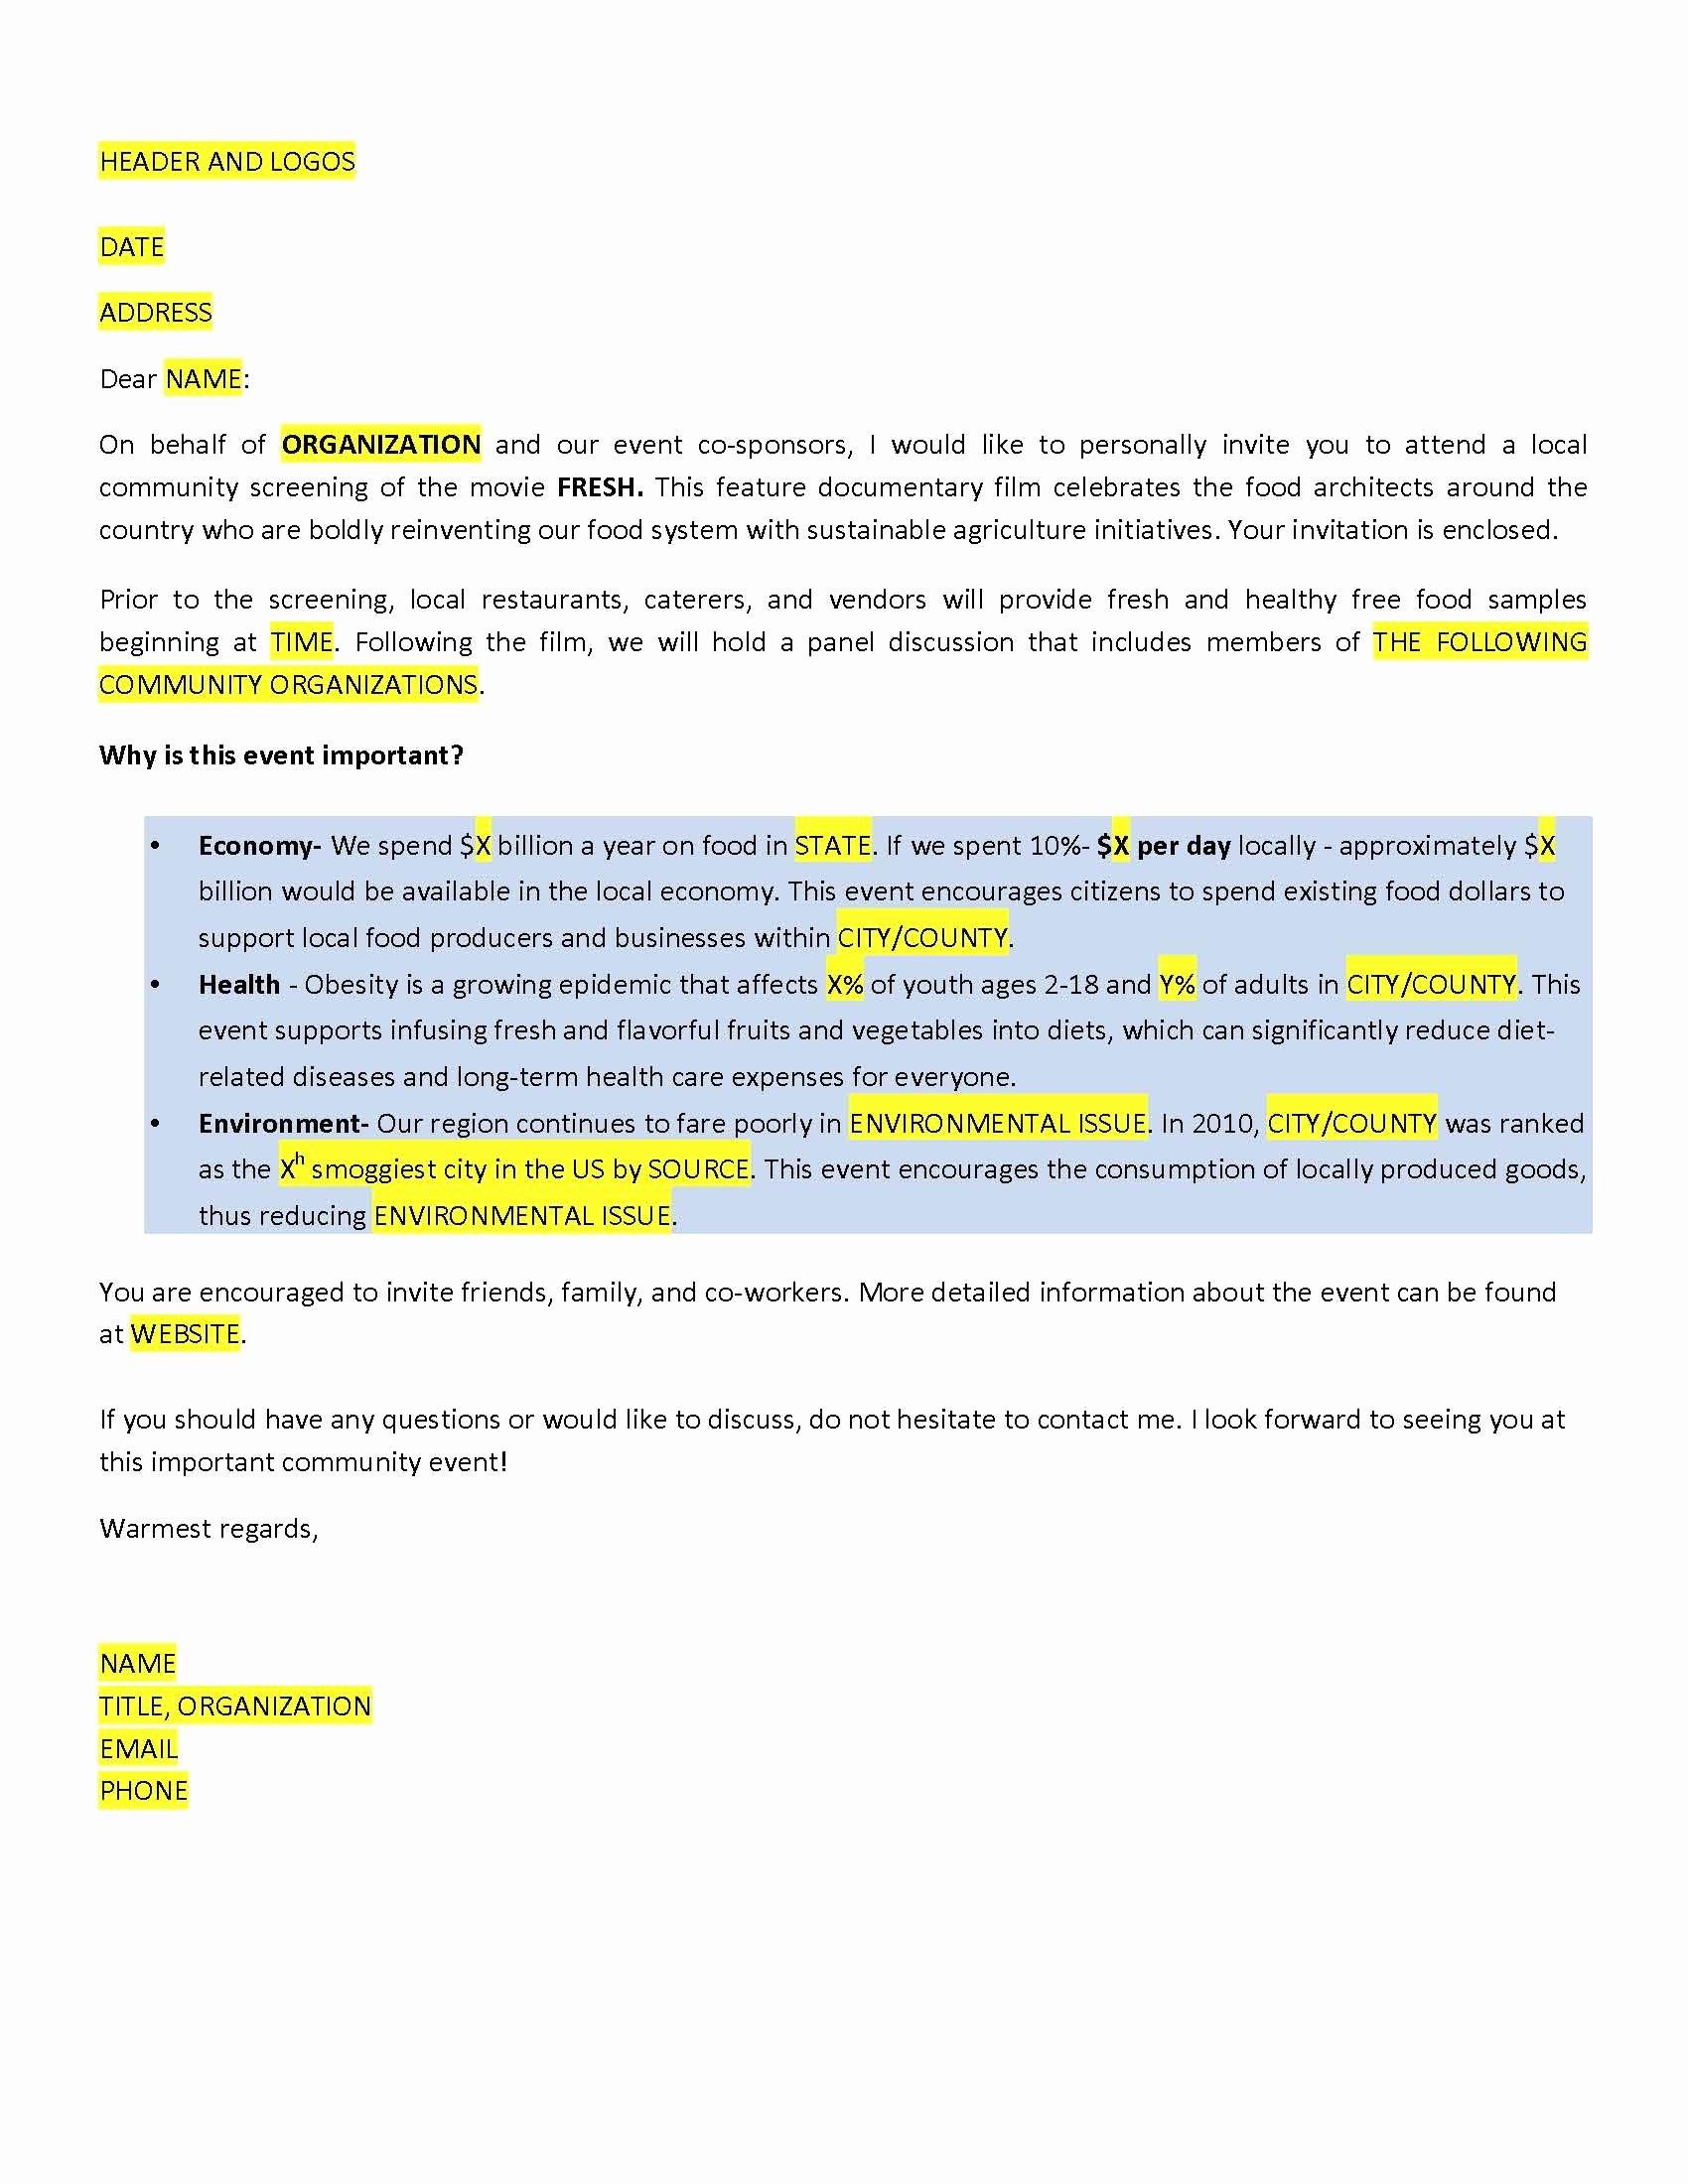 Samples Of Invitation Letters Elegant Sample Invitation Letter Invitation Letters for Allvisa